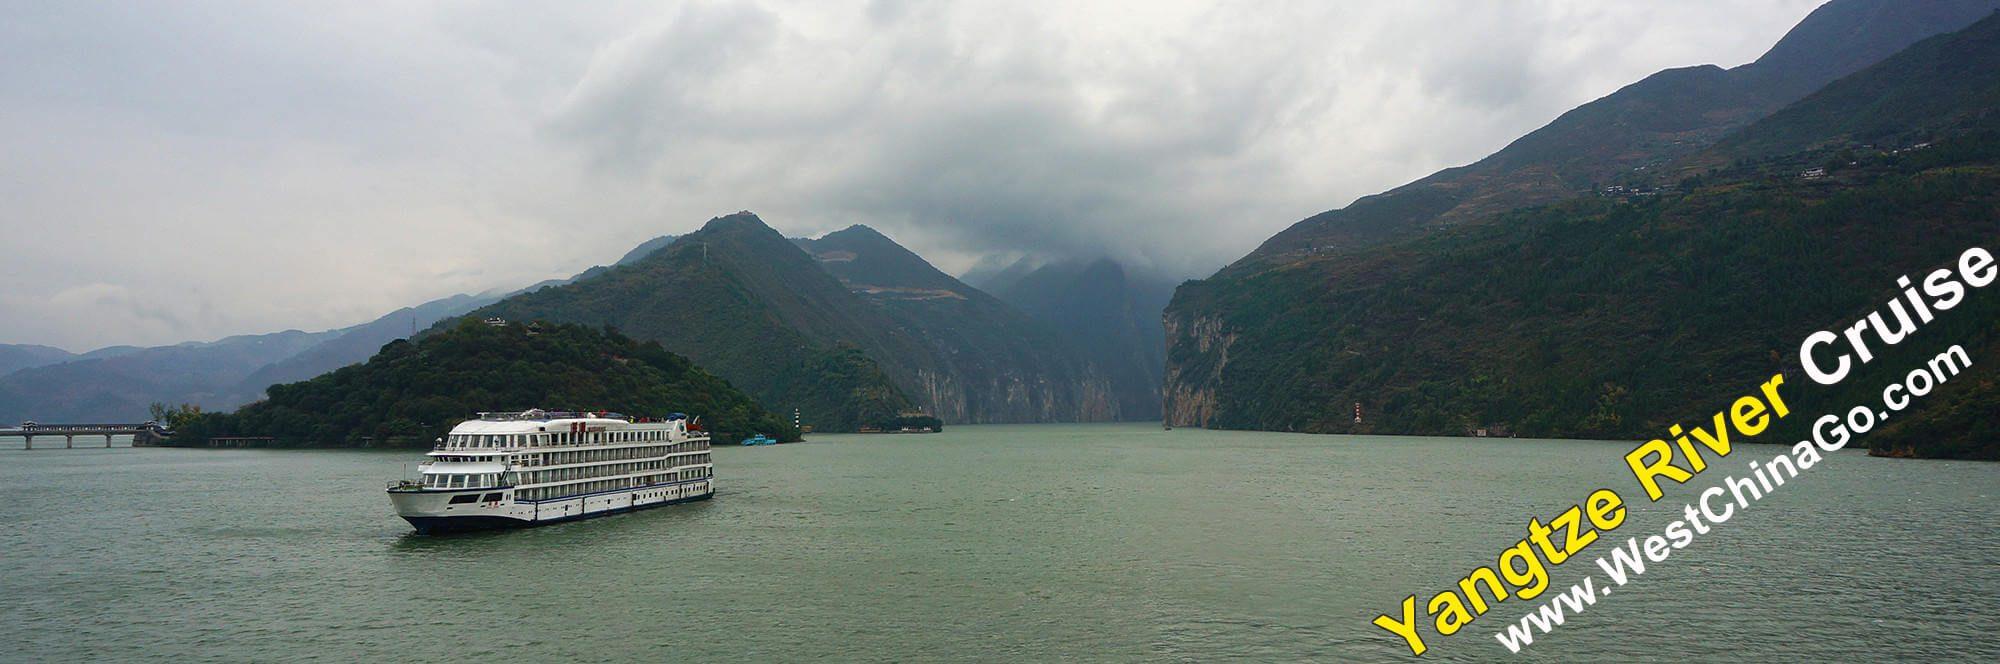 2018 yangtze river cruise